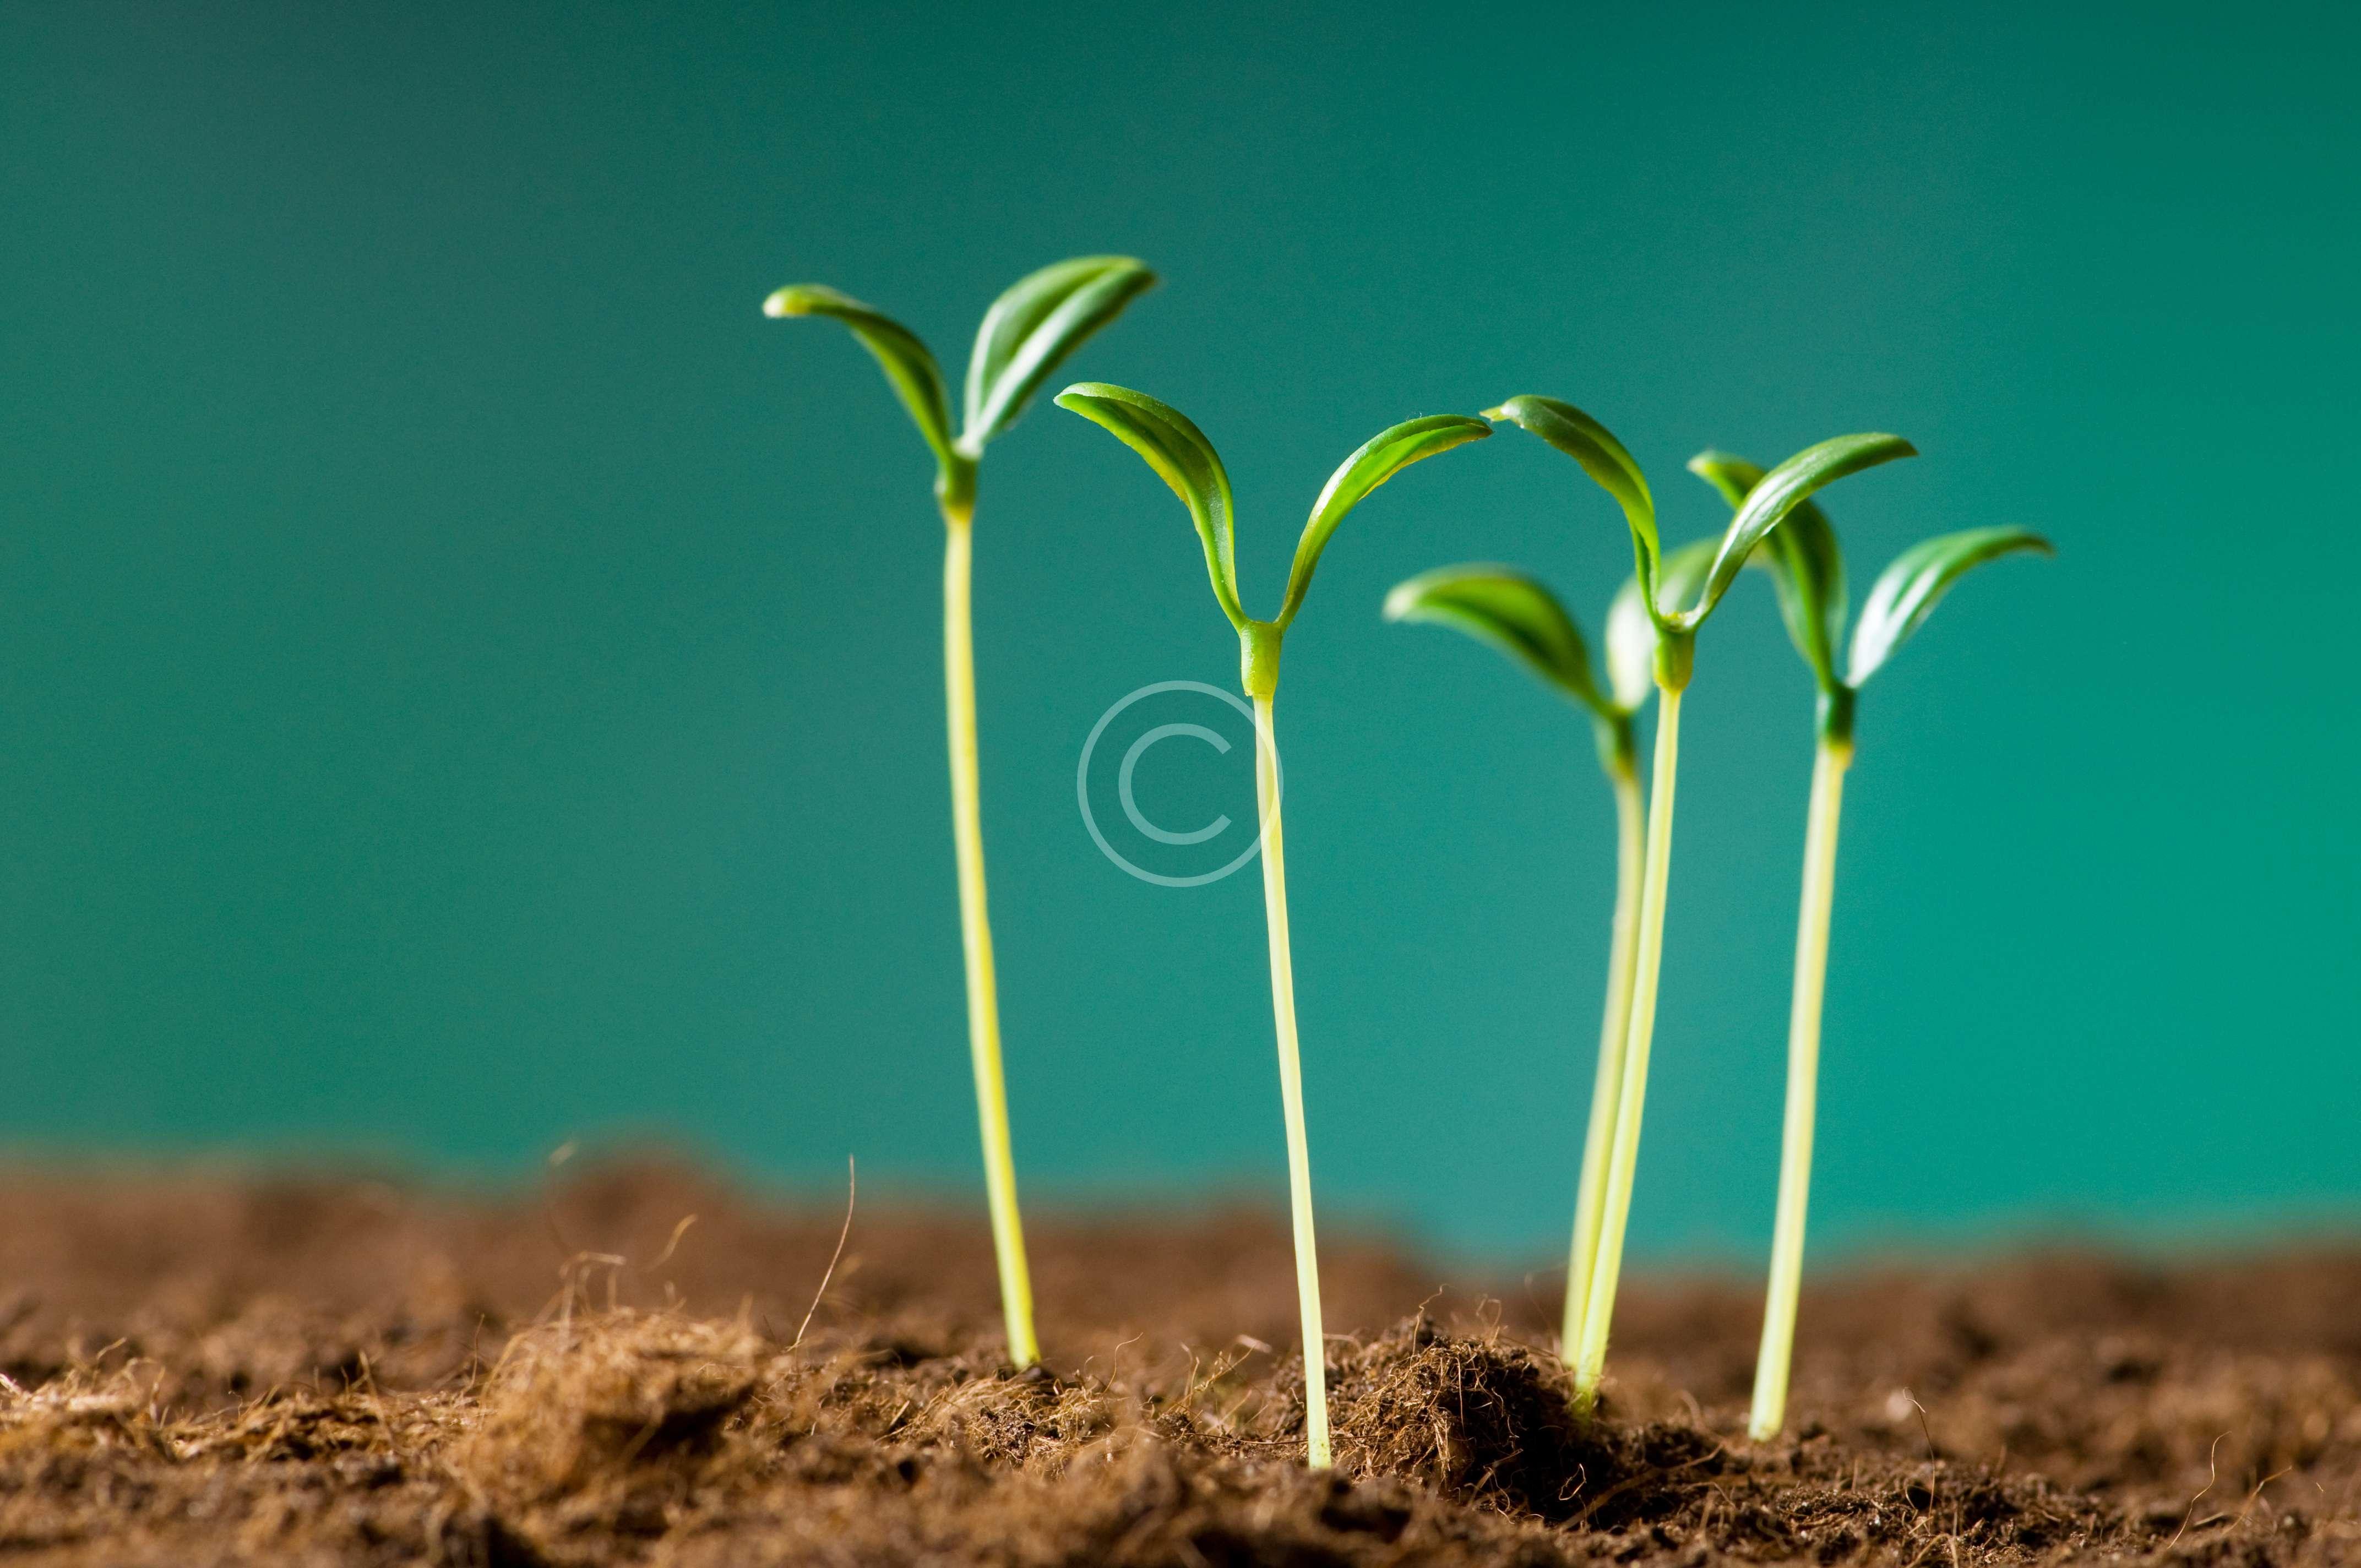 bigstock-Green-seedling-illustrating-co-14319230